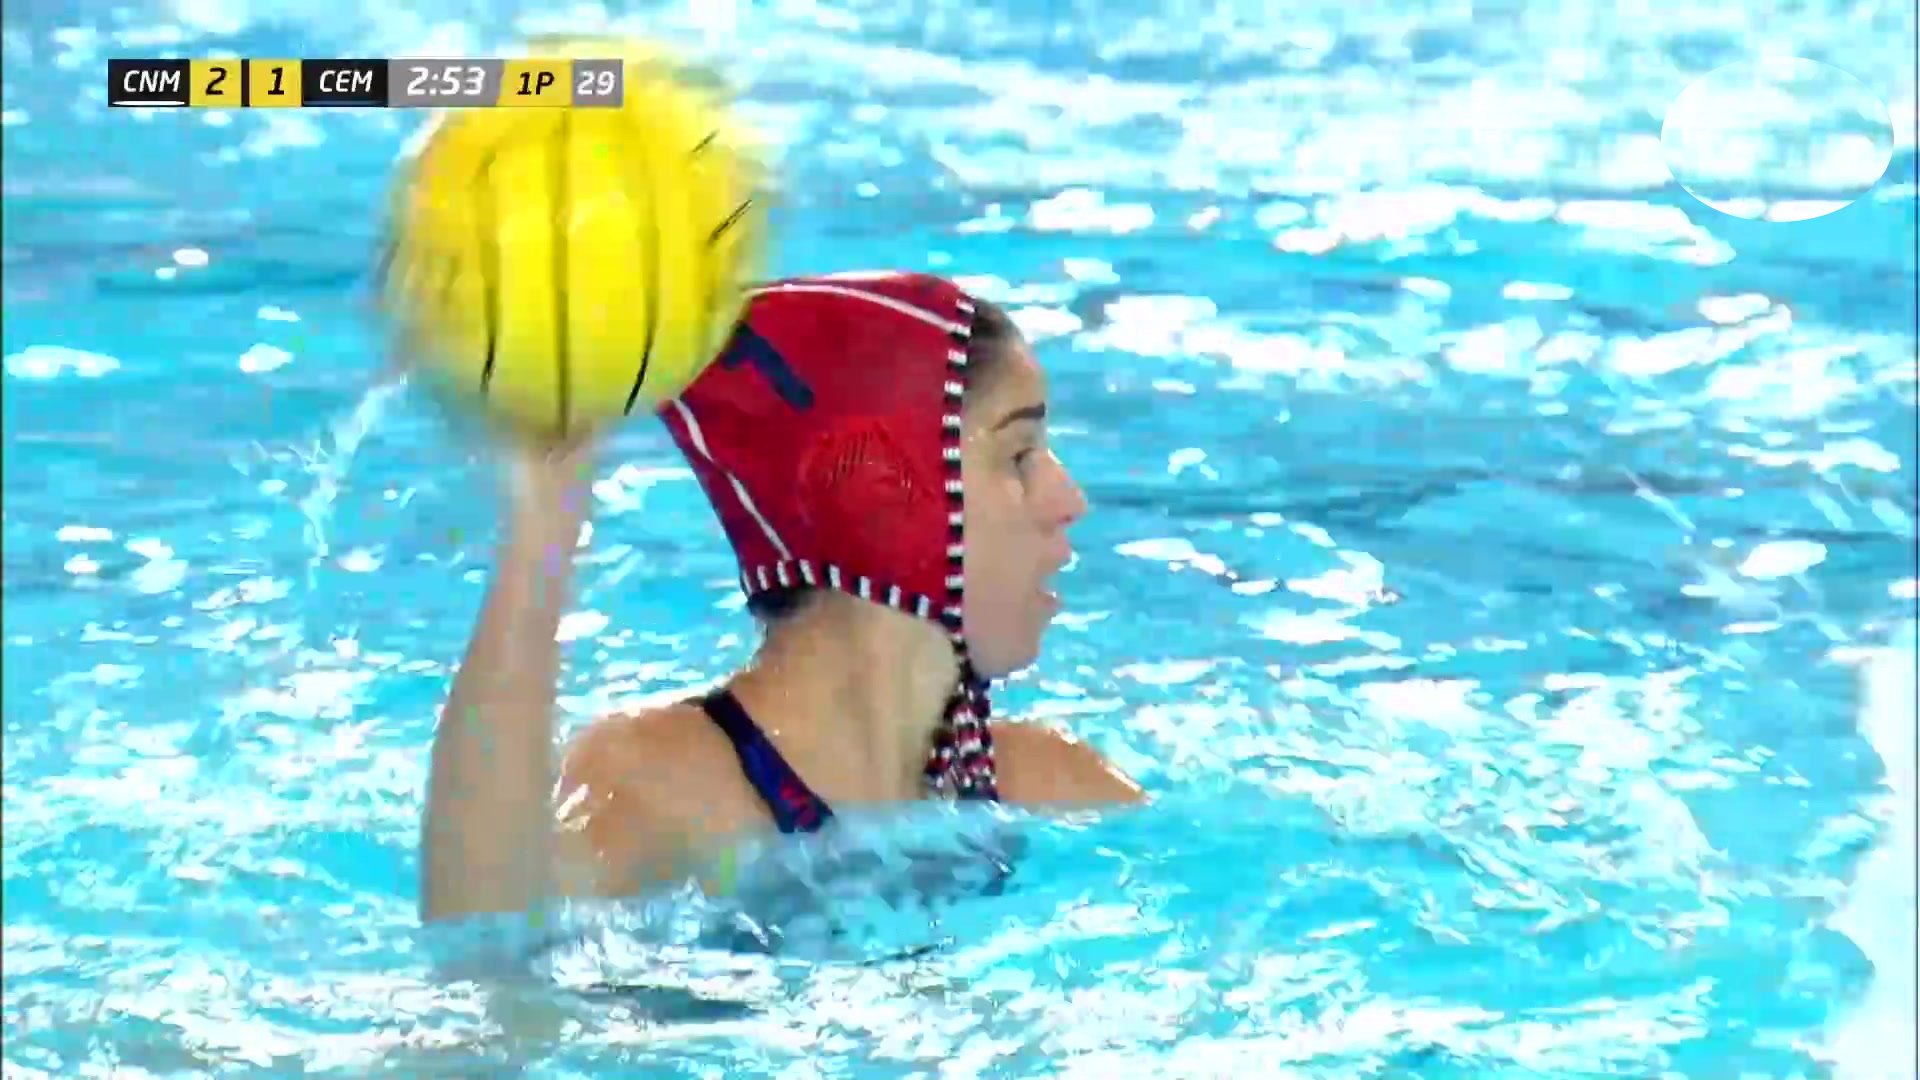 Copa la Reina, 1ª semifinal: CN Mataró - CE Mediterrani